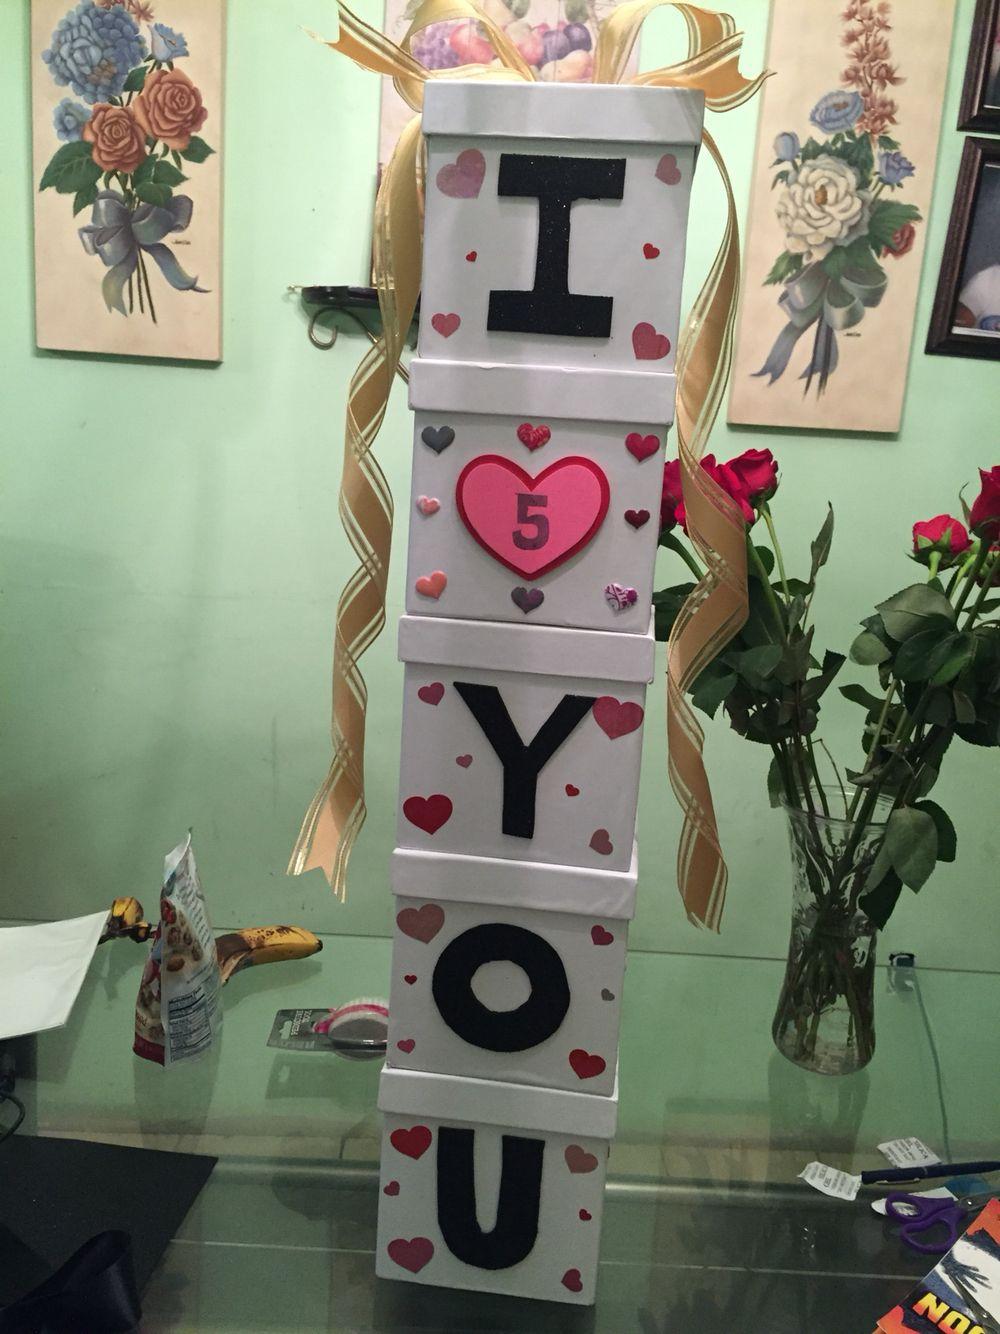 5 Year Anniversary Present For Boyfriend Presents For Boyfriend Anniversary 5 Year Anniversary Gift Diy Anniversary Gift